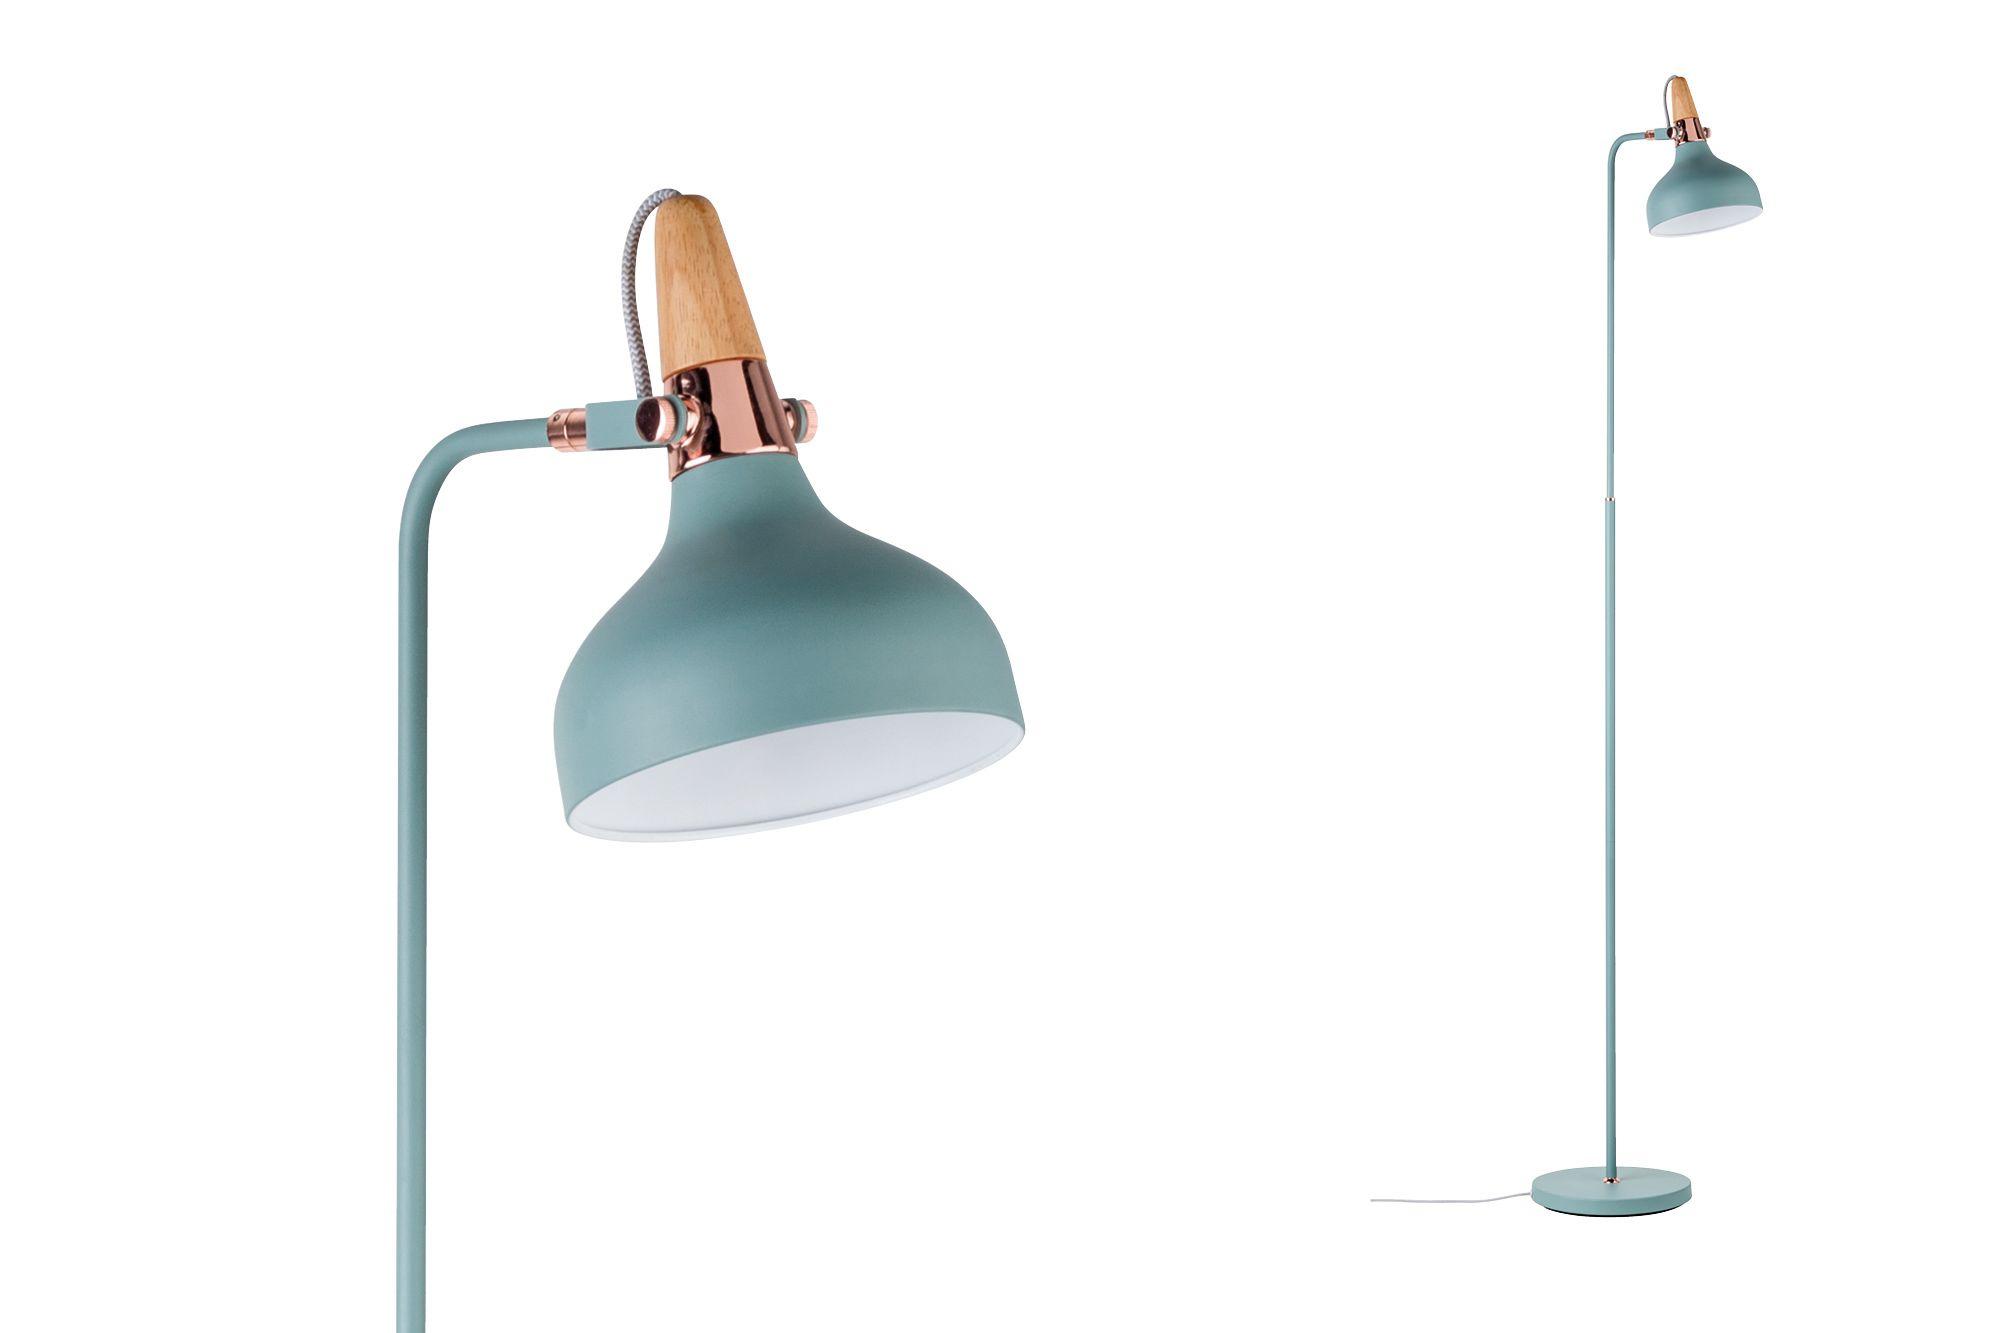 Lampada In Rame Design : Fantastiche immagini in lampade in rame su nel